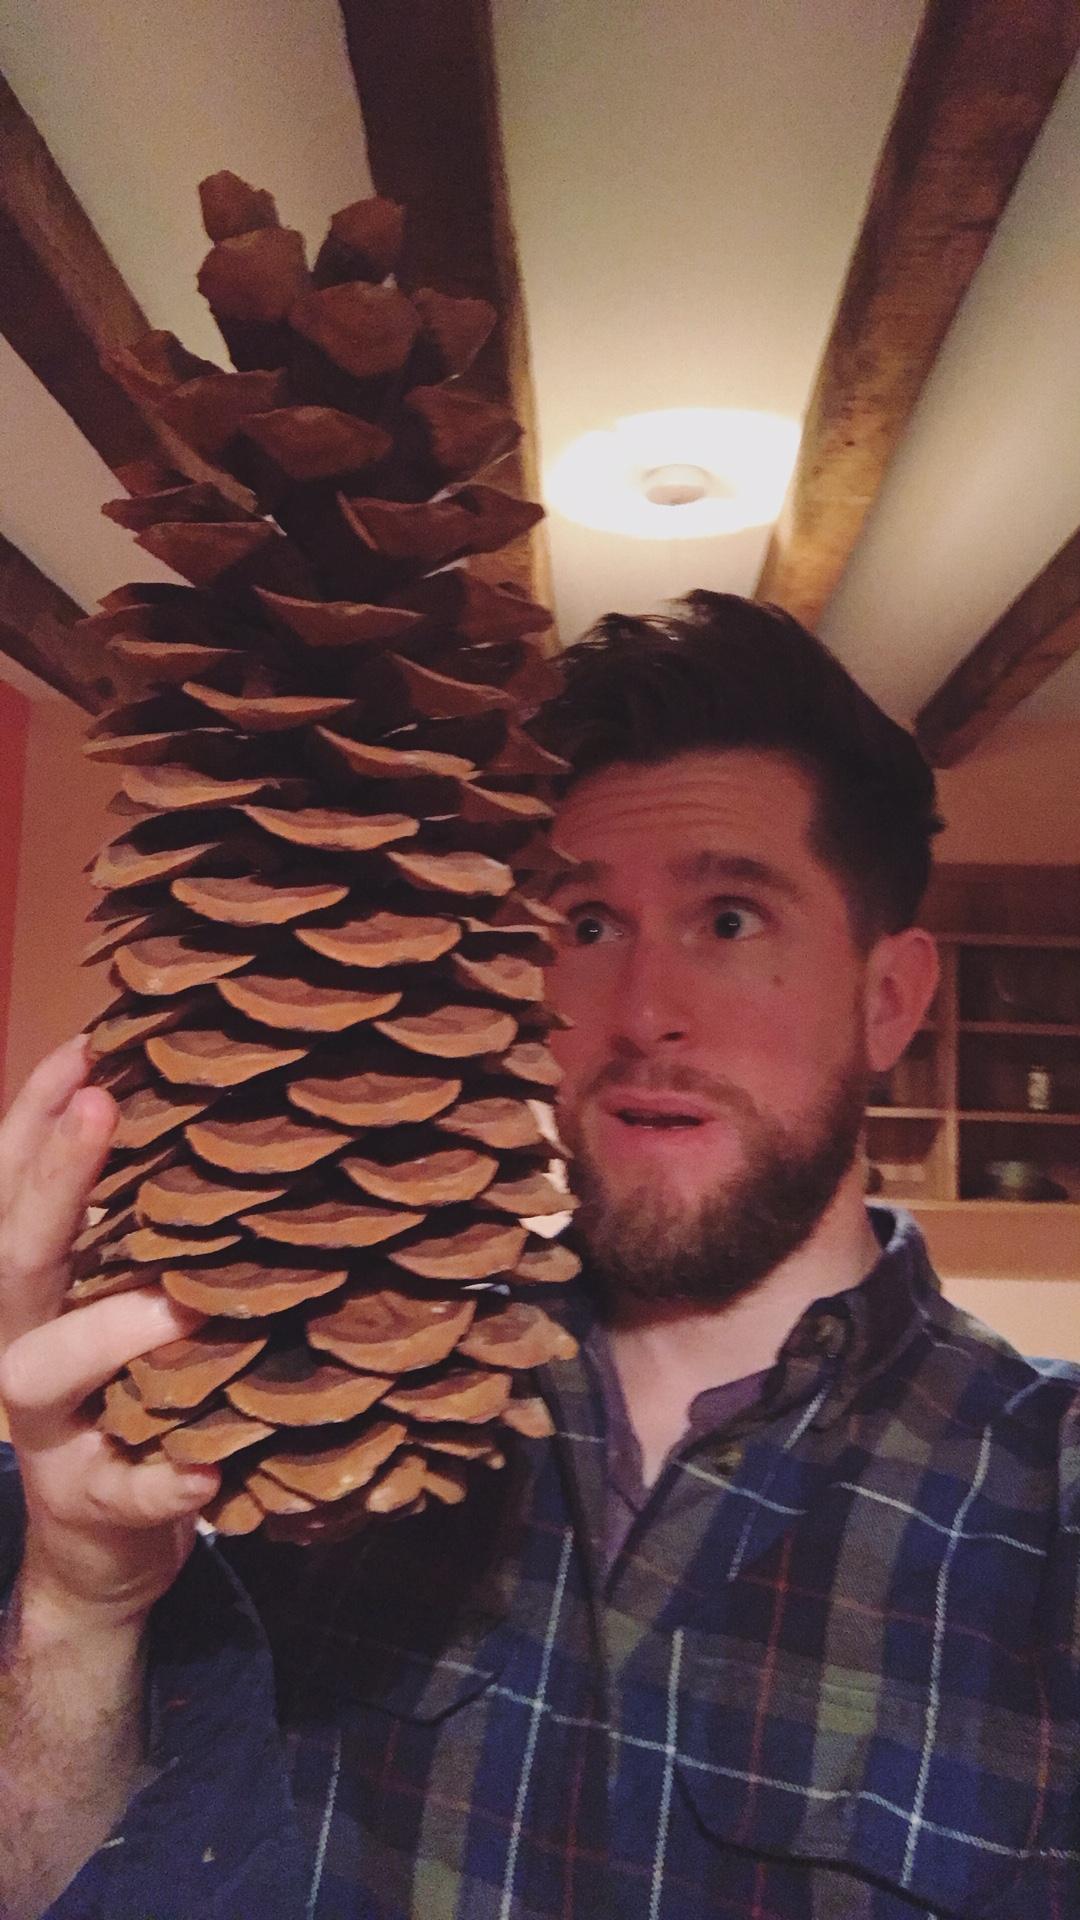 Giant Pine Cone